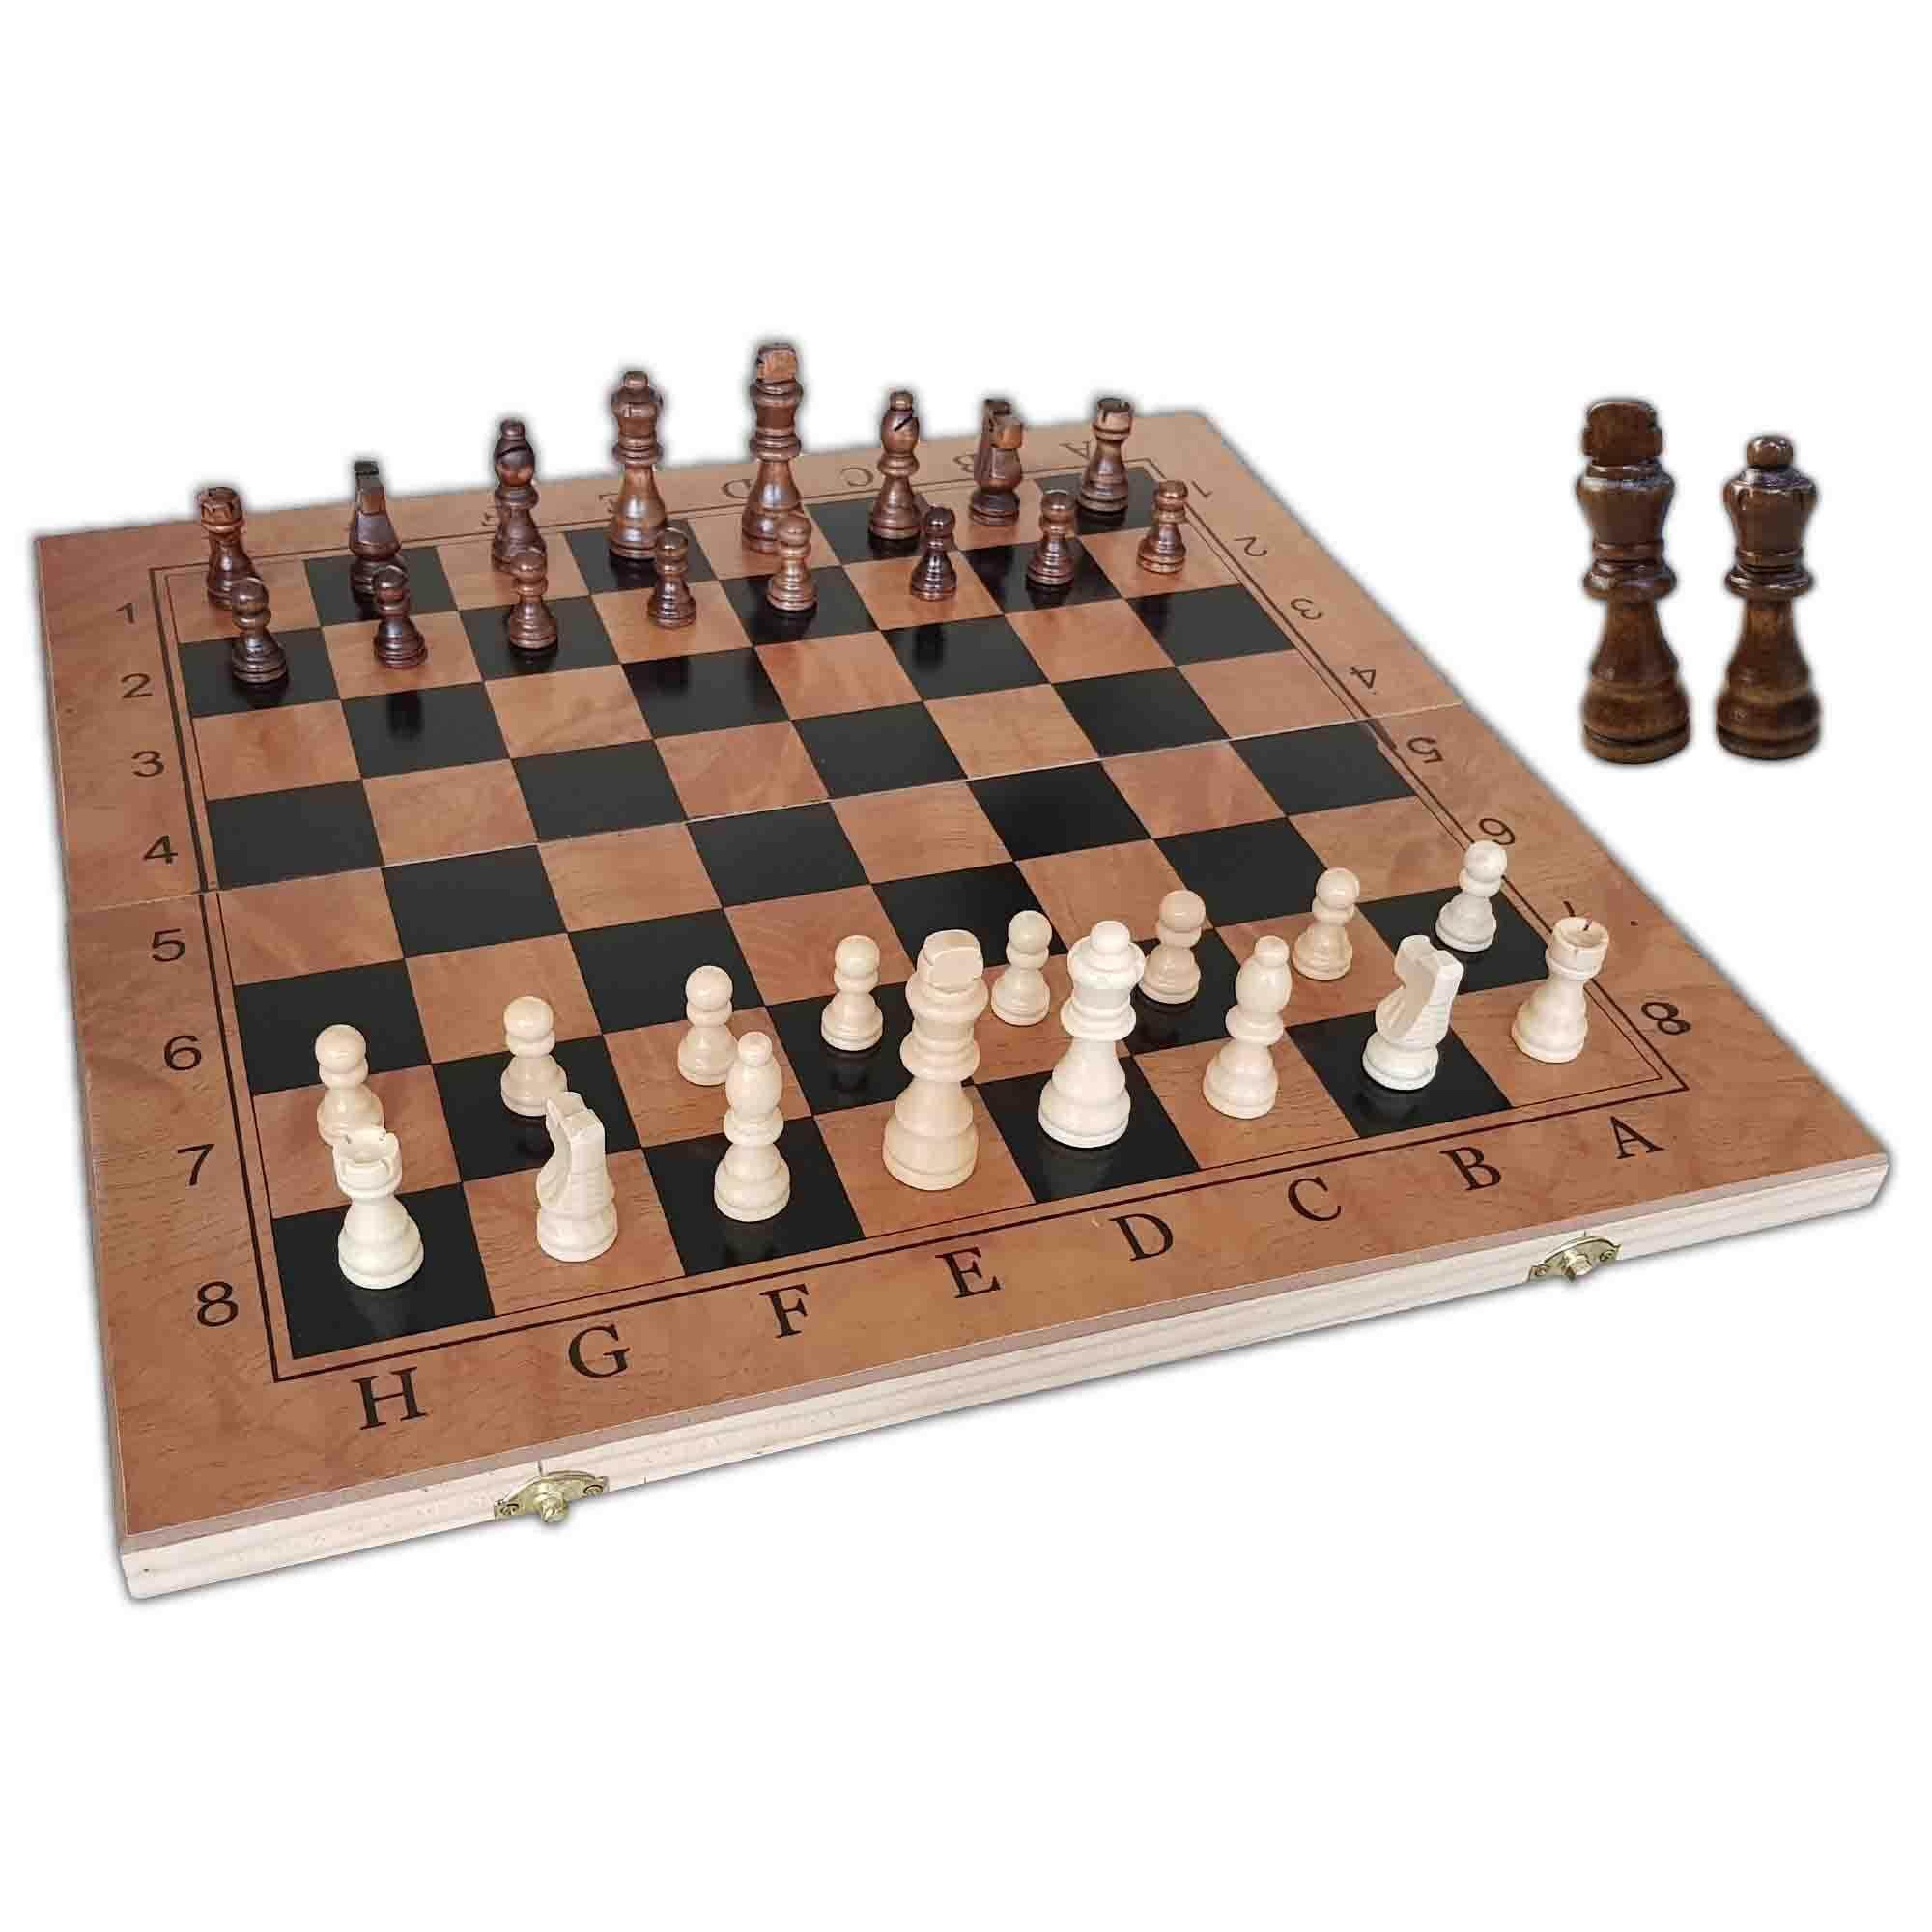 Portable Wooden Tournament Chess Set 3 in 1 (Chess & Checkers & Backgammon) 48 CM X 48 CM